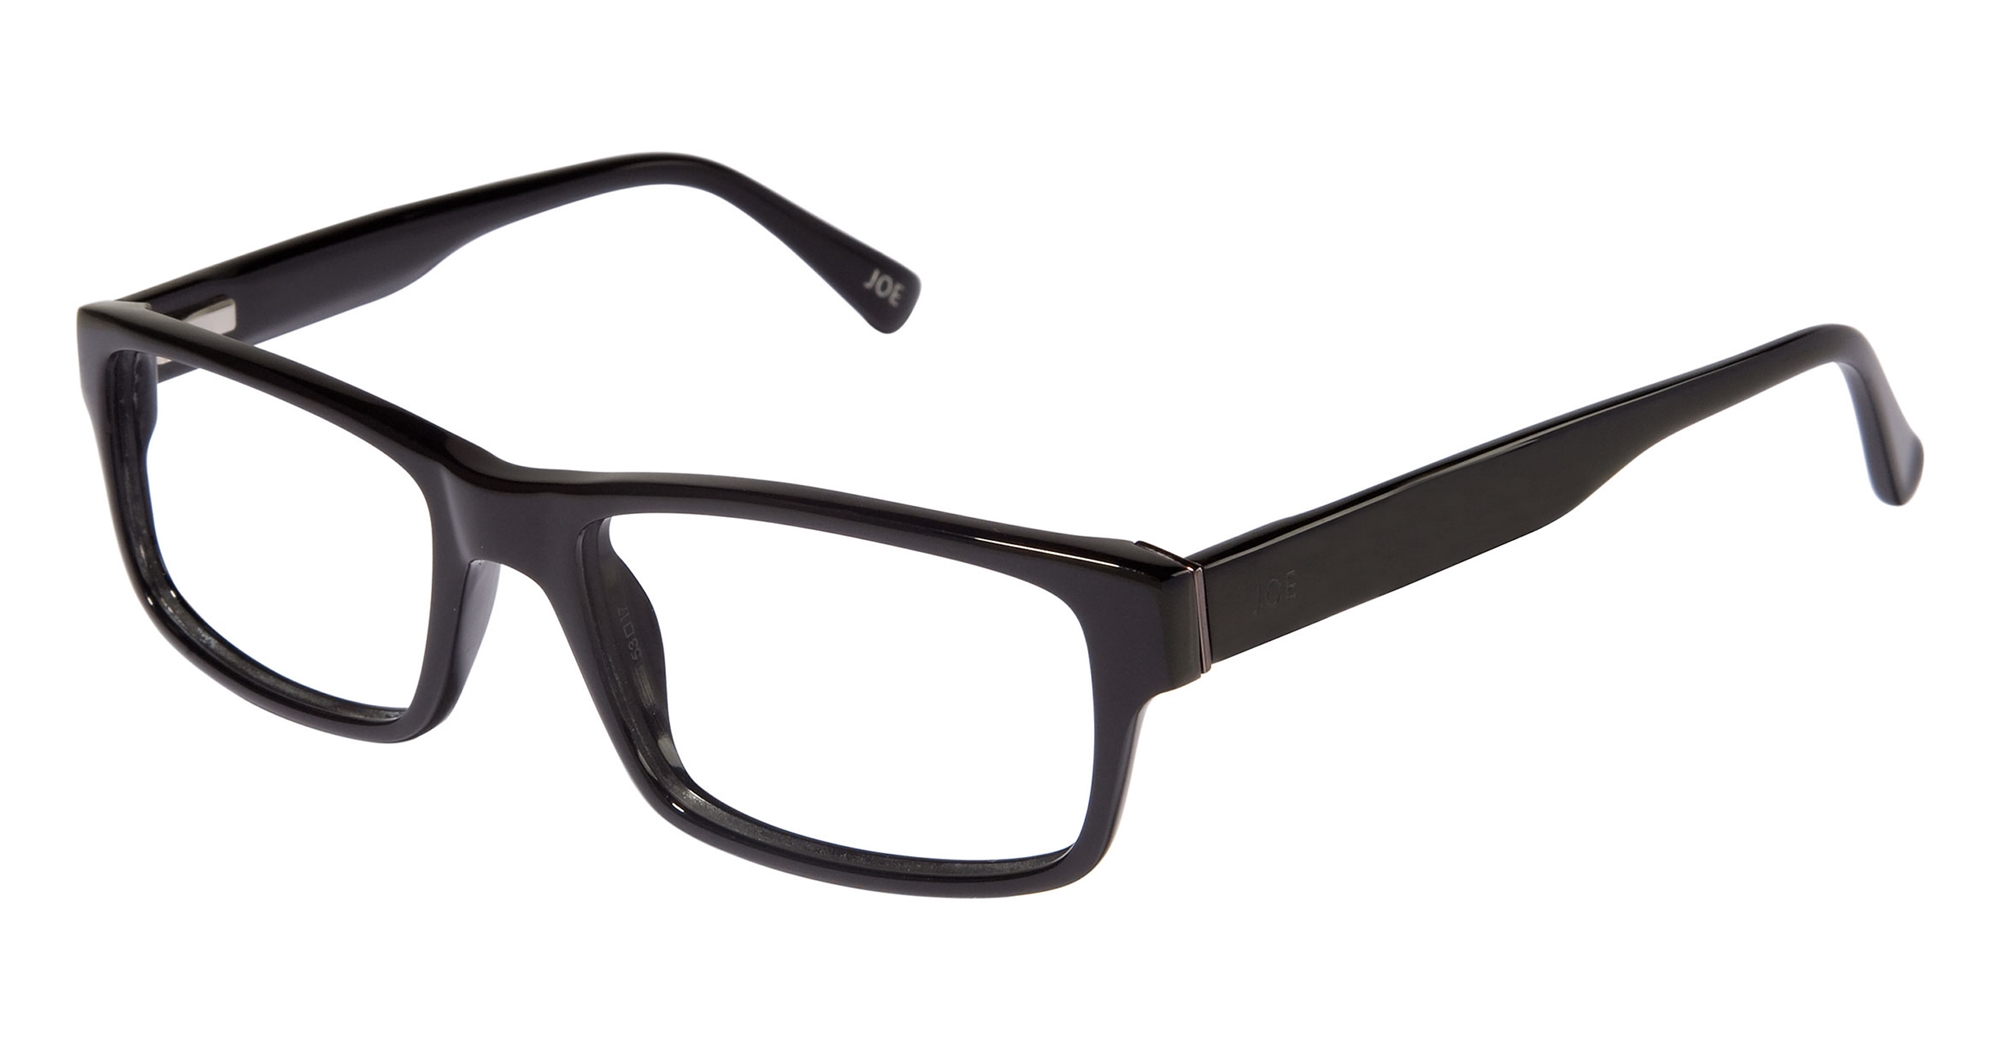 3fdbc6acde95 Joseph abboud blackjack glasses - Tirage du keno horaire